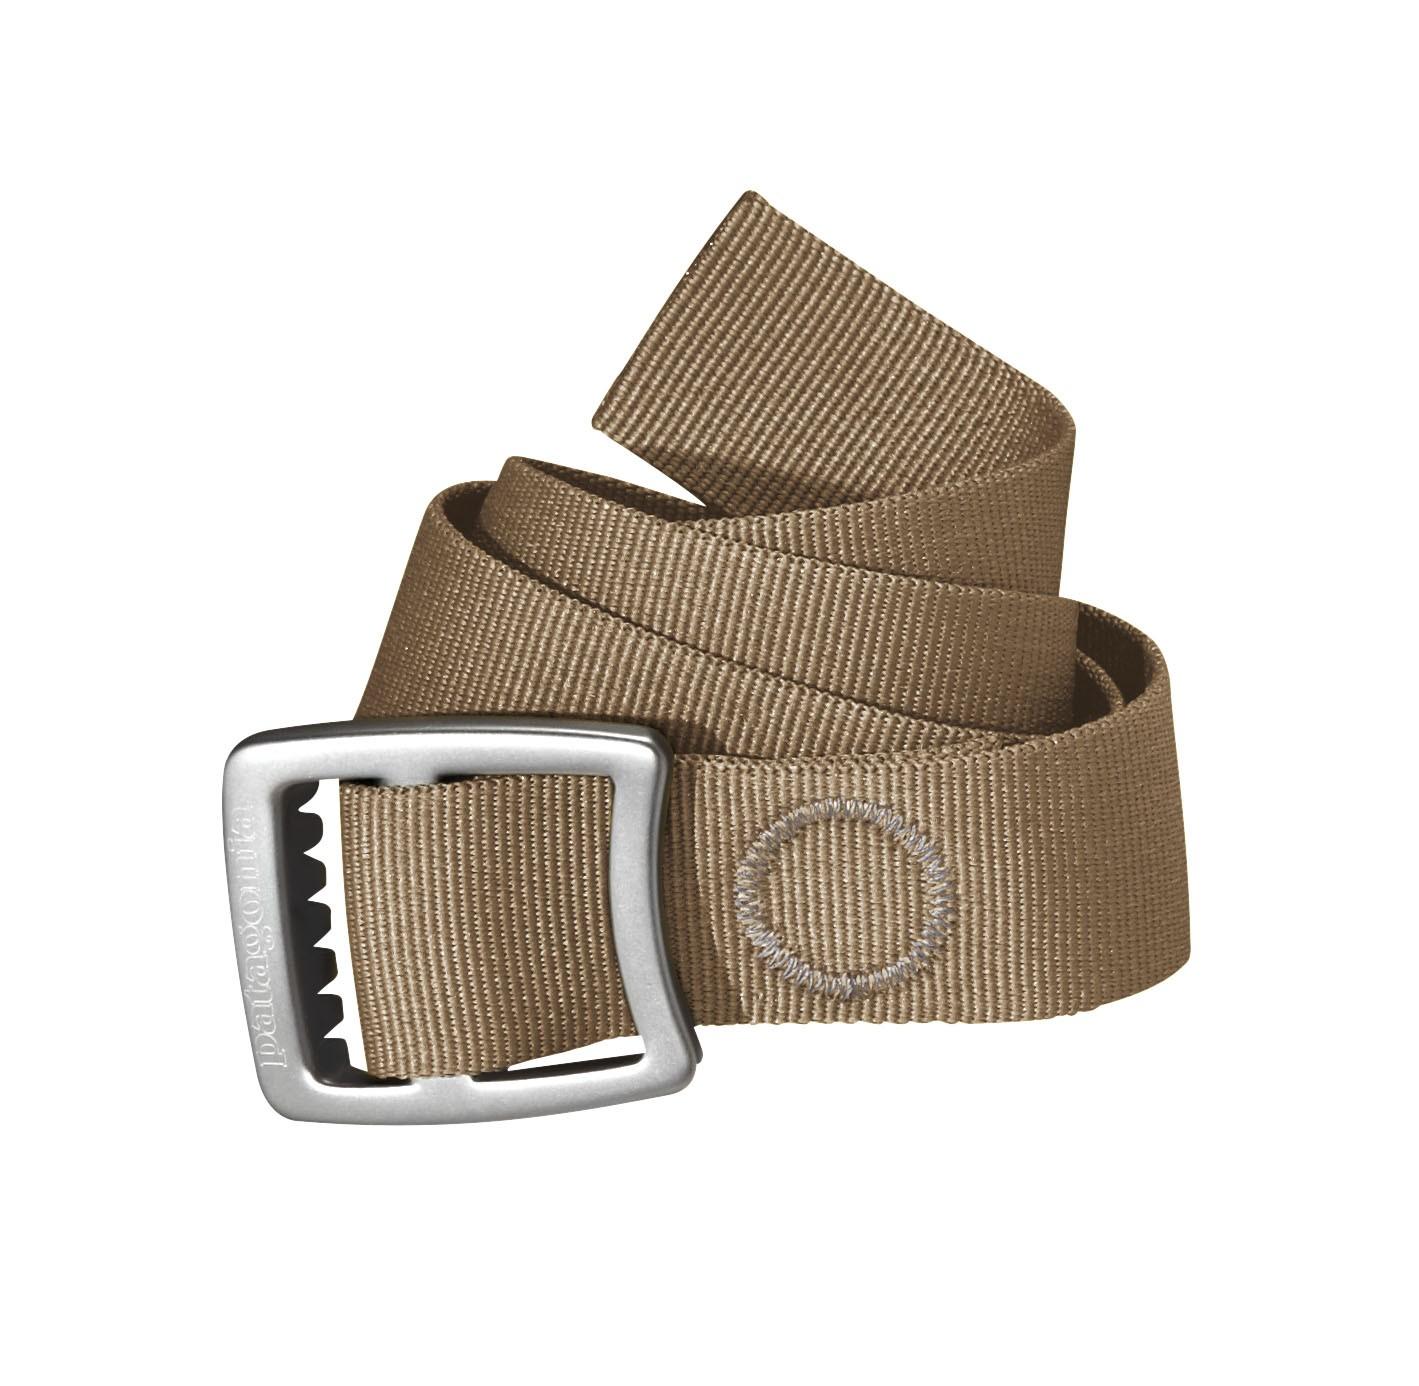 Patagonia Tech Web Belt -Mojave Khaki